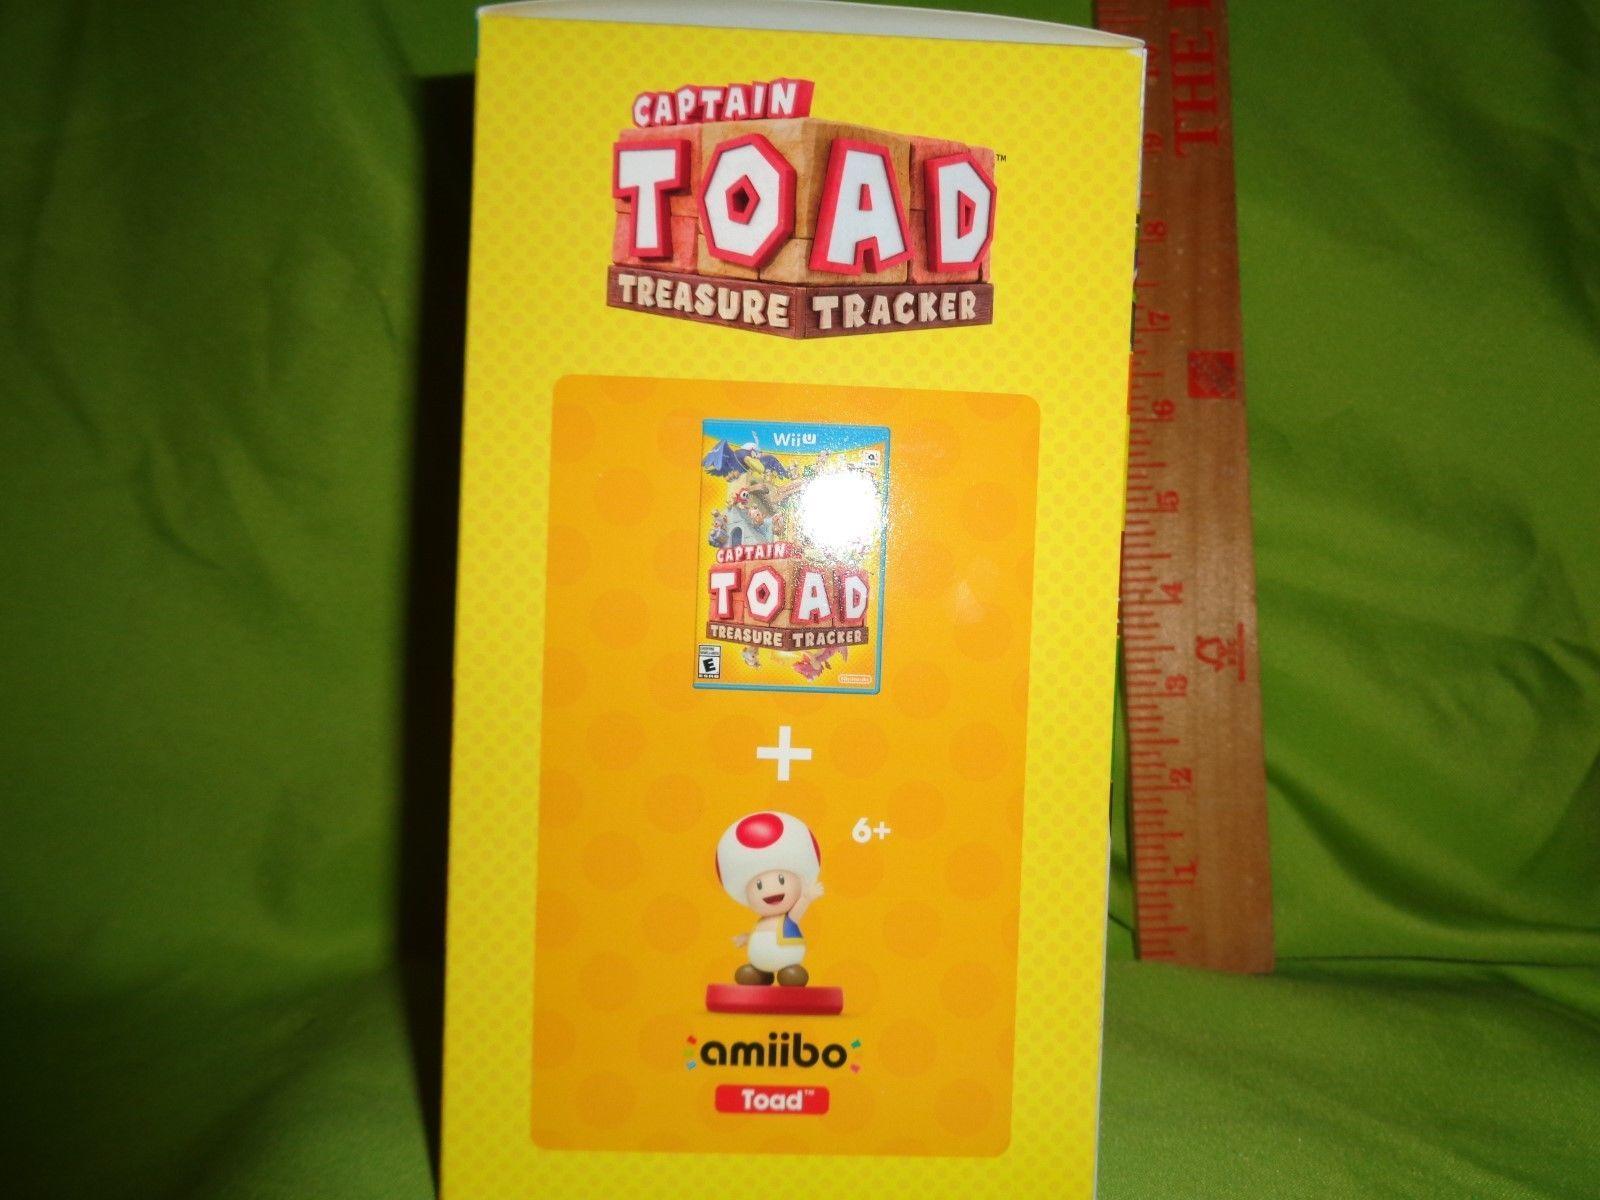 Captain Toad: Treasure Tracker + Toad AMIIBO (Nintendo Wii U, 2016)